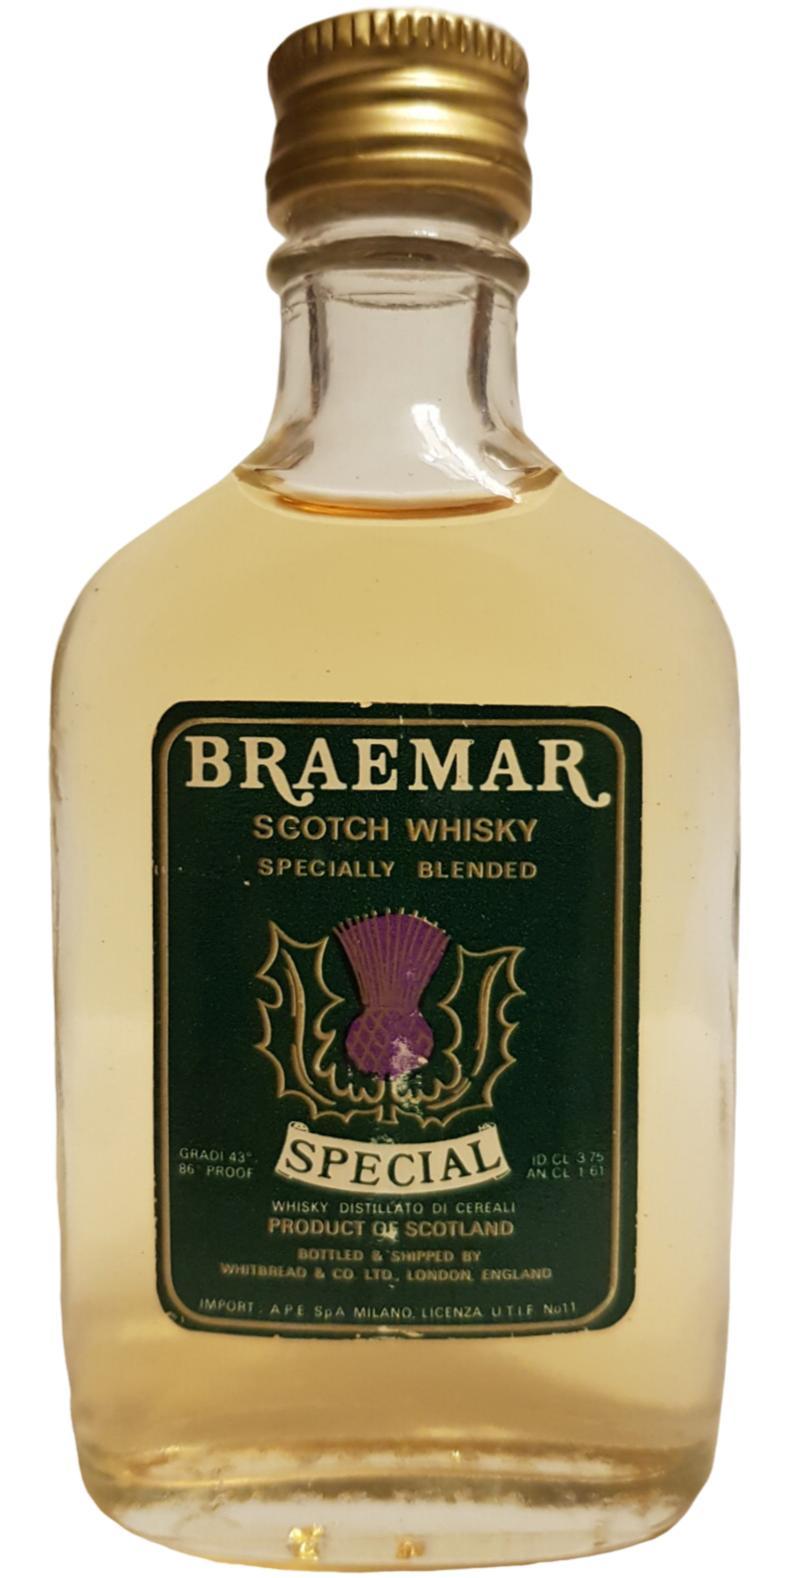 Braemar Special